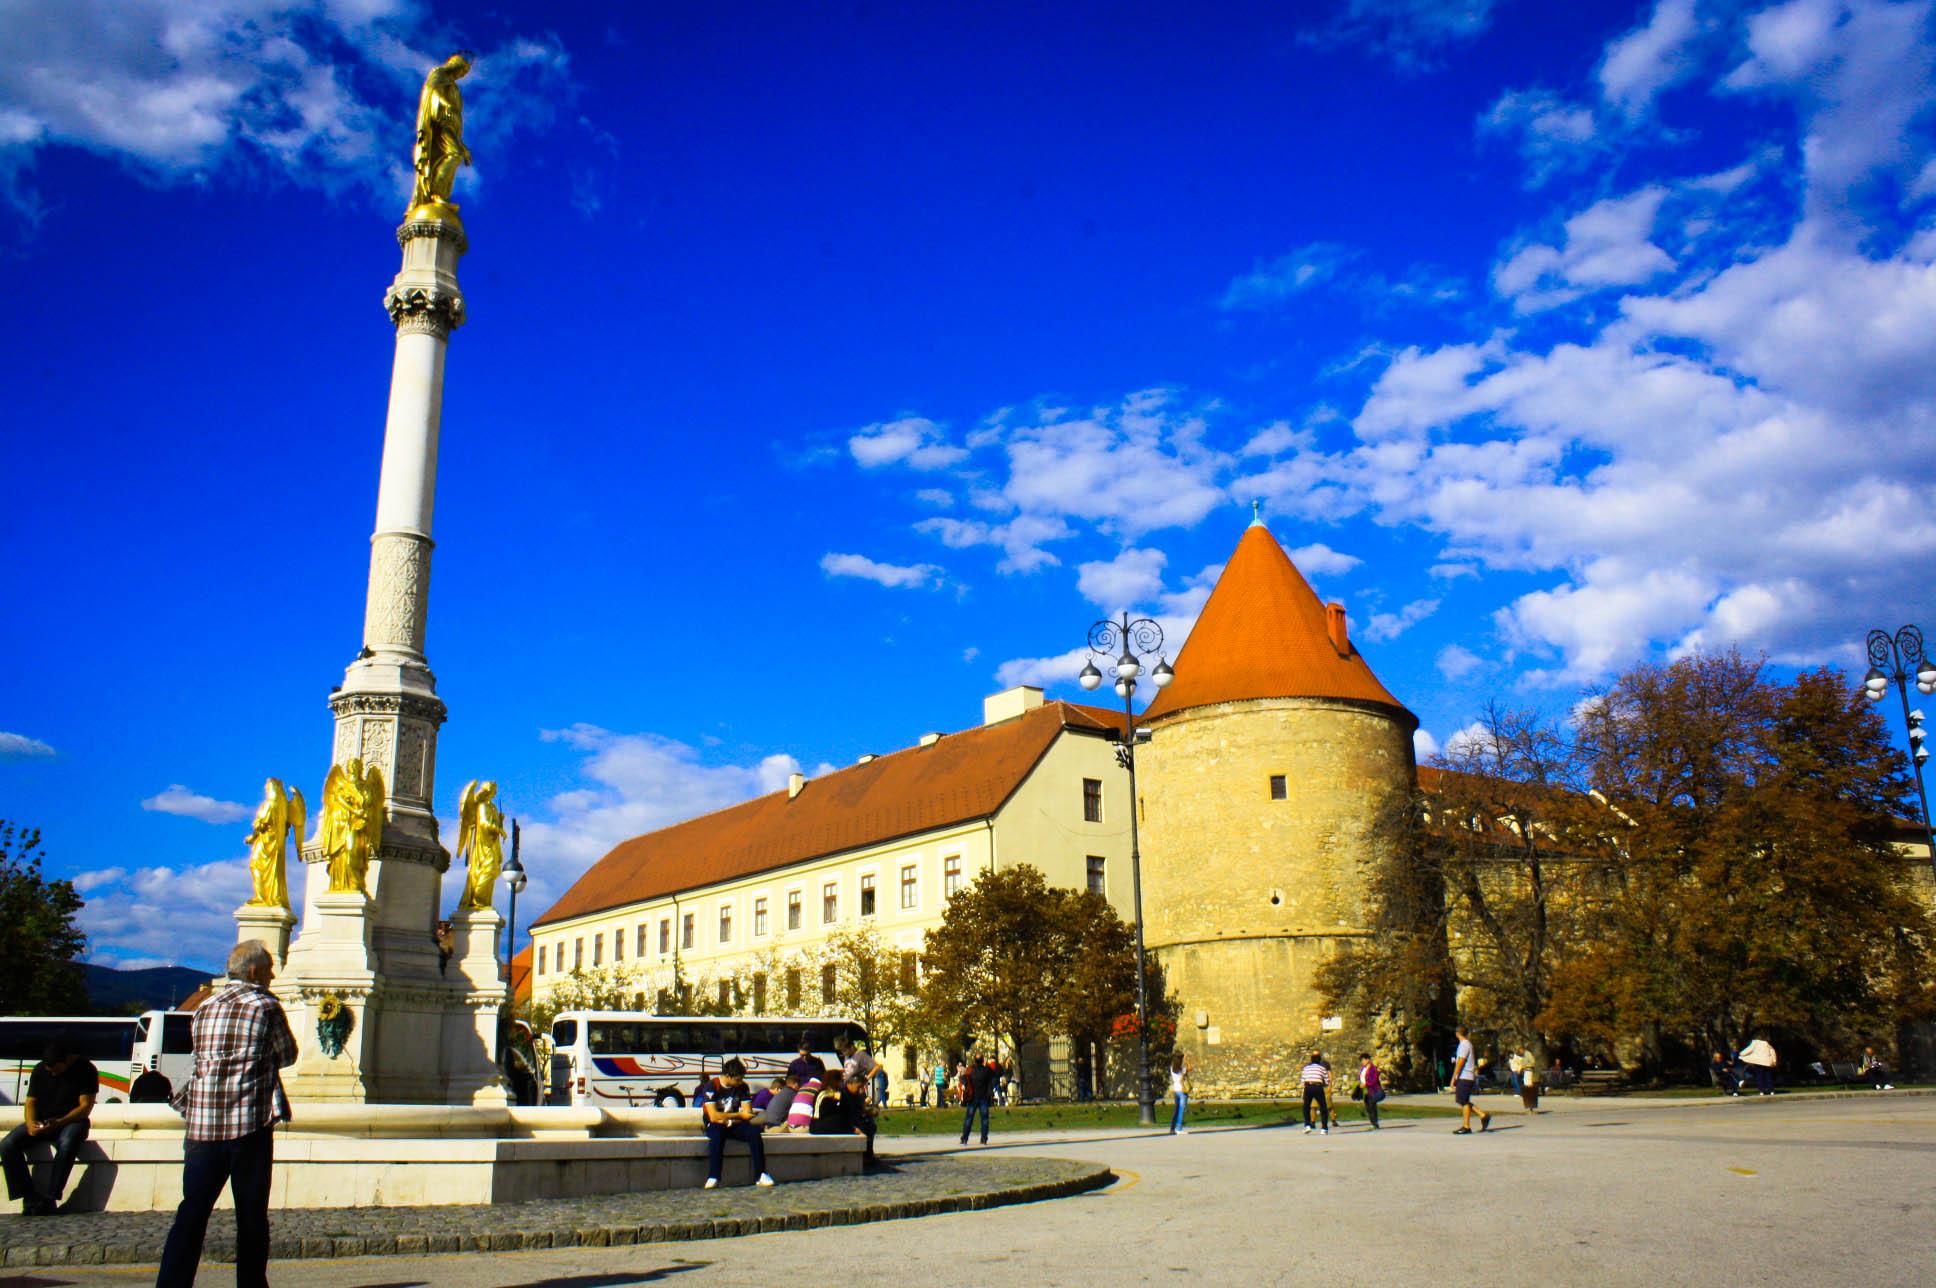 Central Croatia